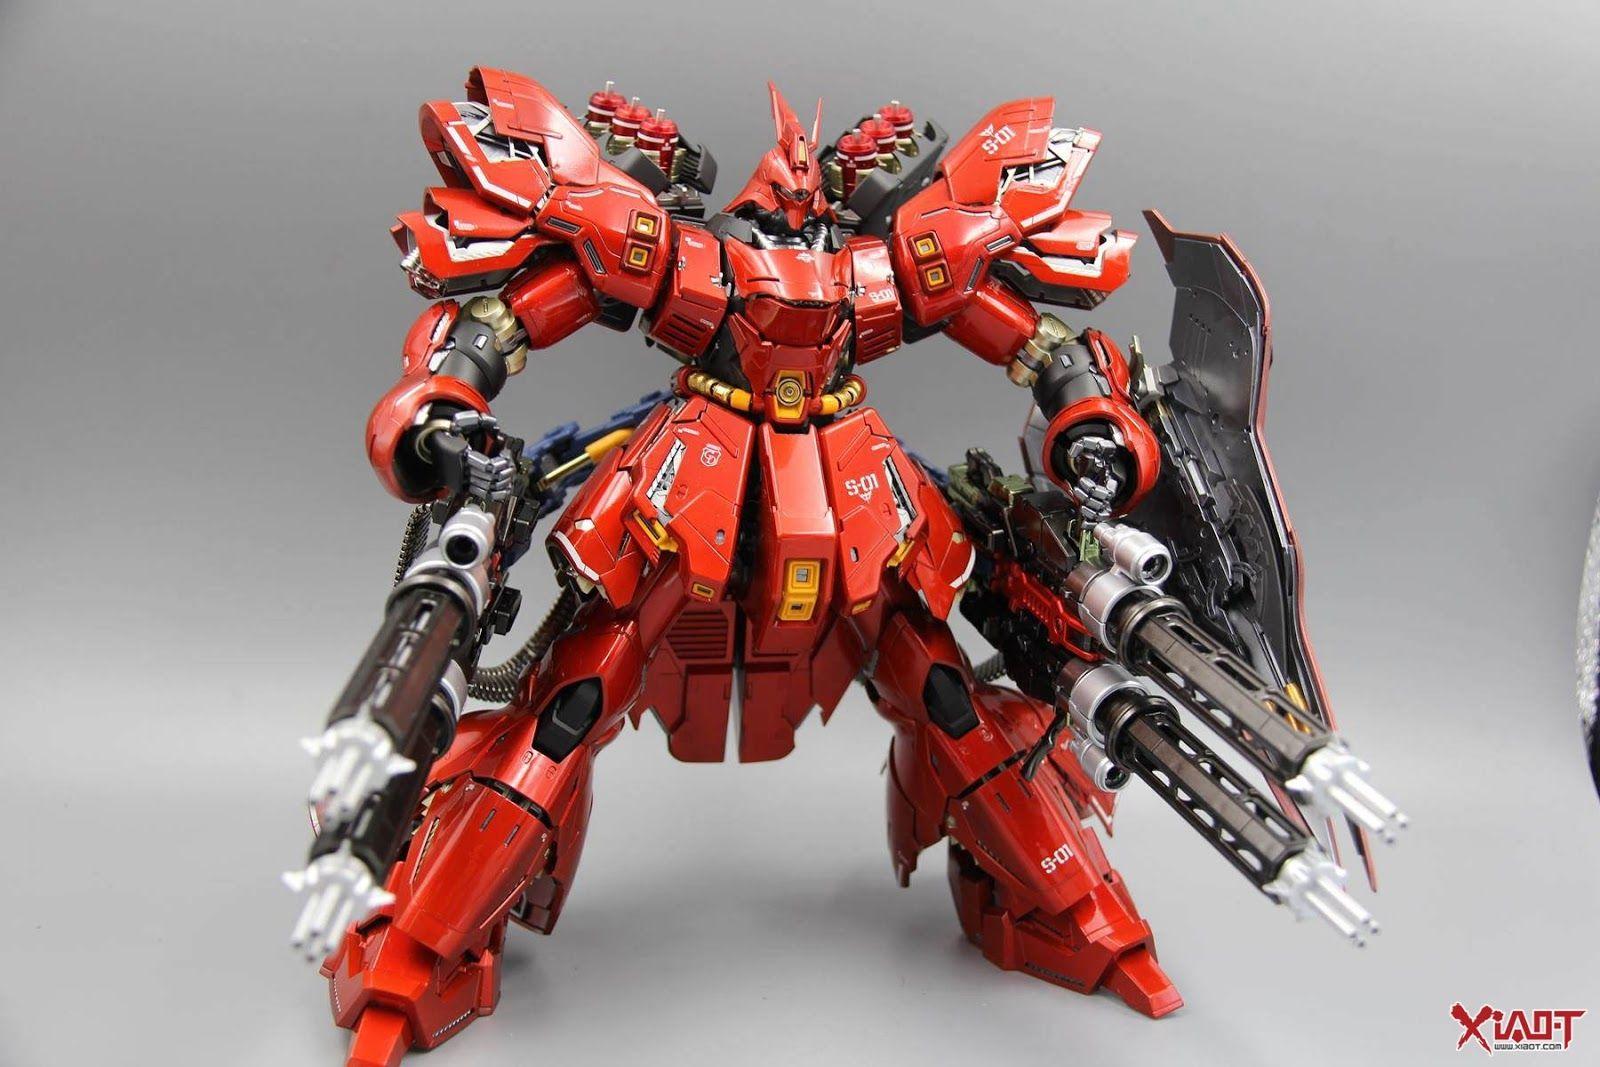 MG 1/100 Sazabi Ver Ka Customized Build Gundam